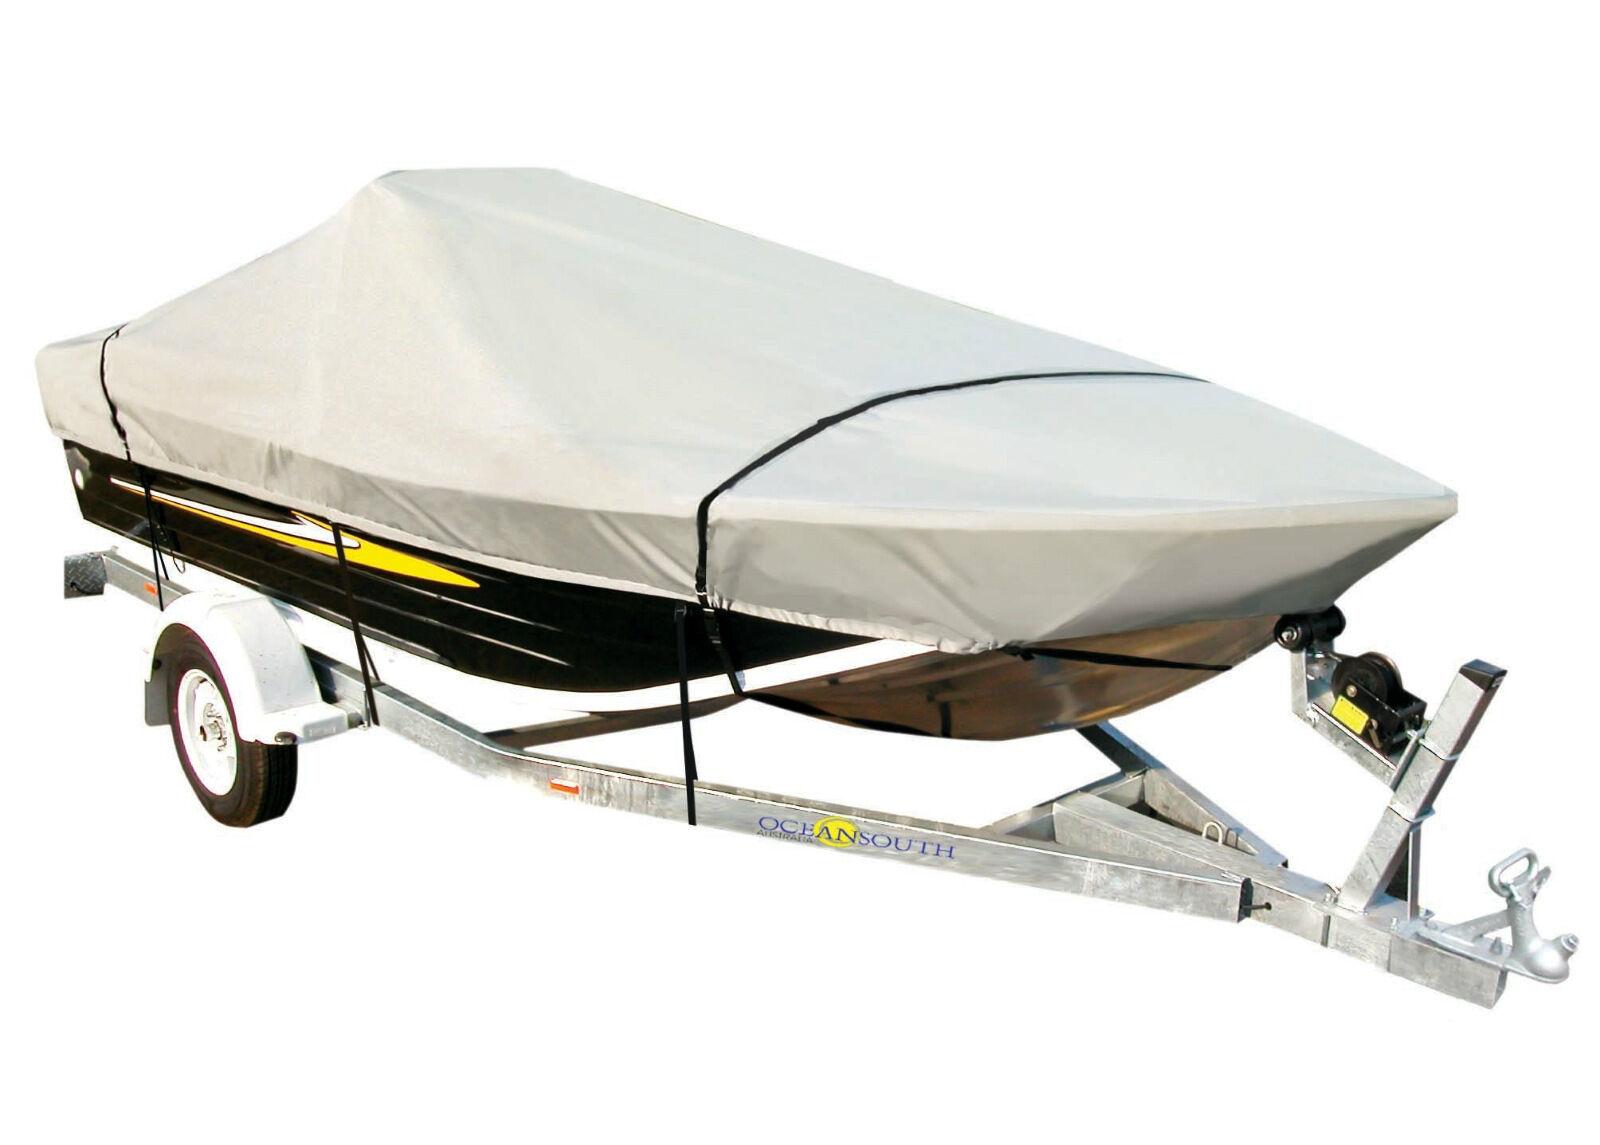 OceanSouth Venepeite sivupulpetti veneille 5.0-5.3 m